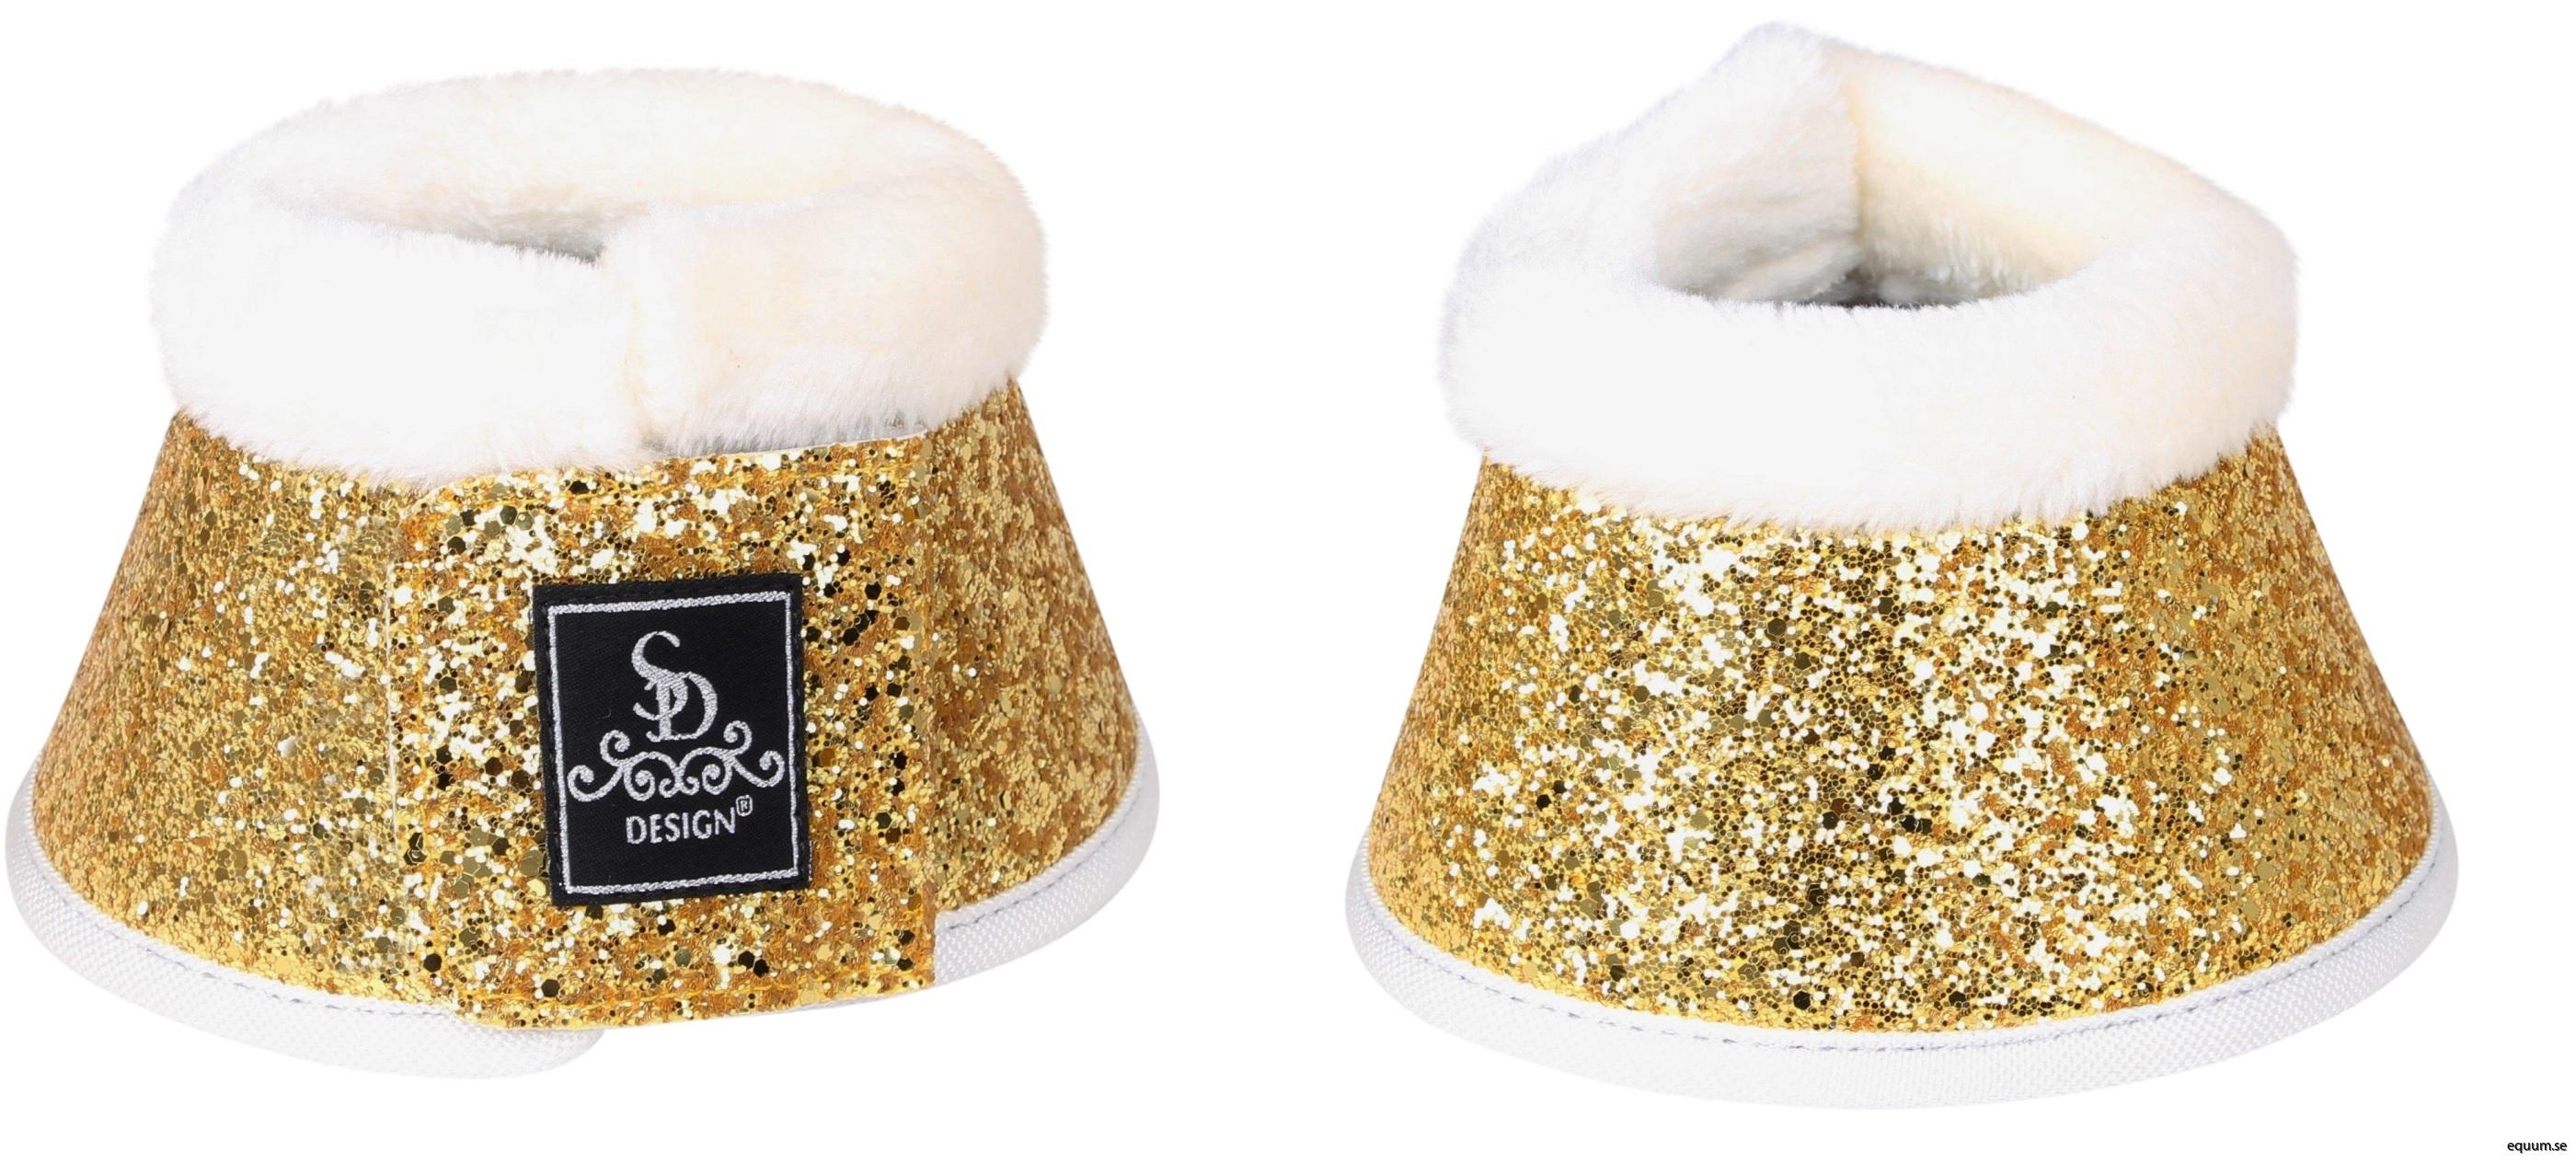 o-240-SD-gold-glitter-bell-boots1